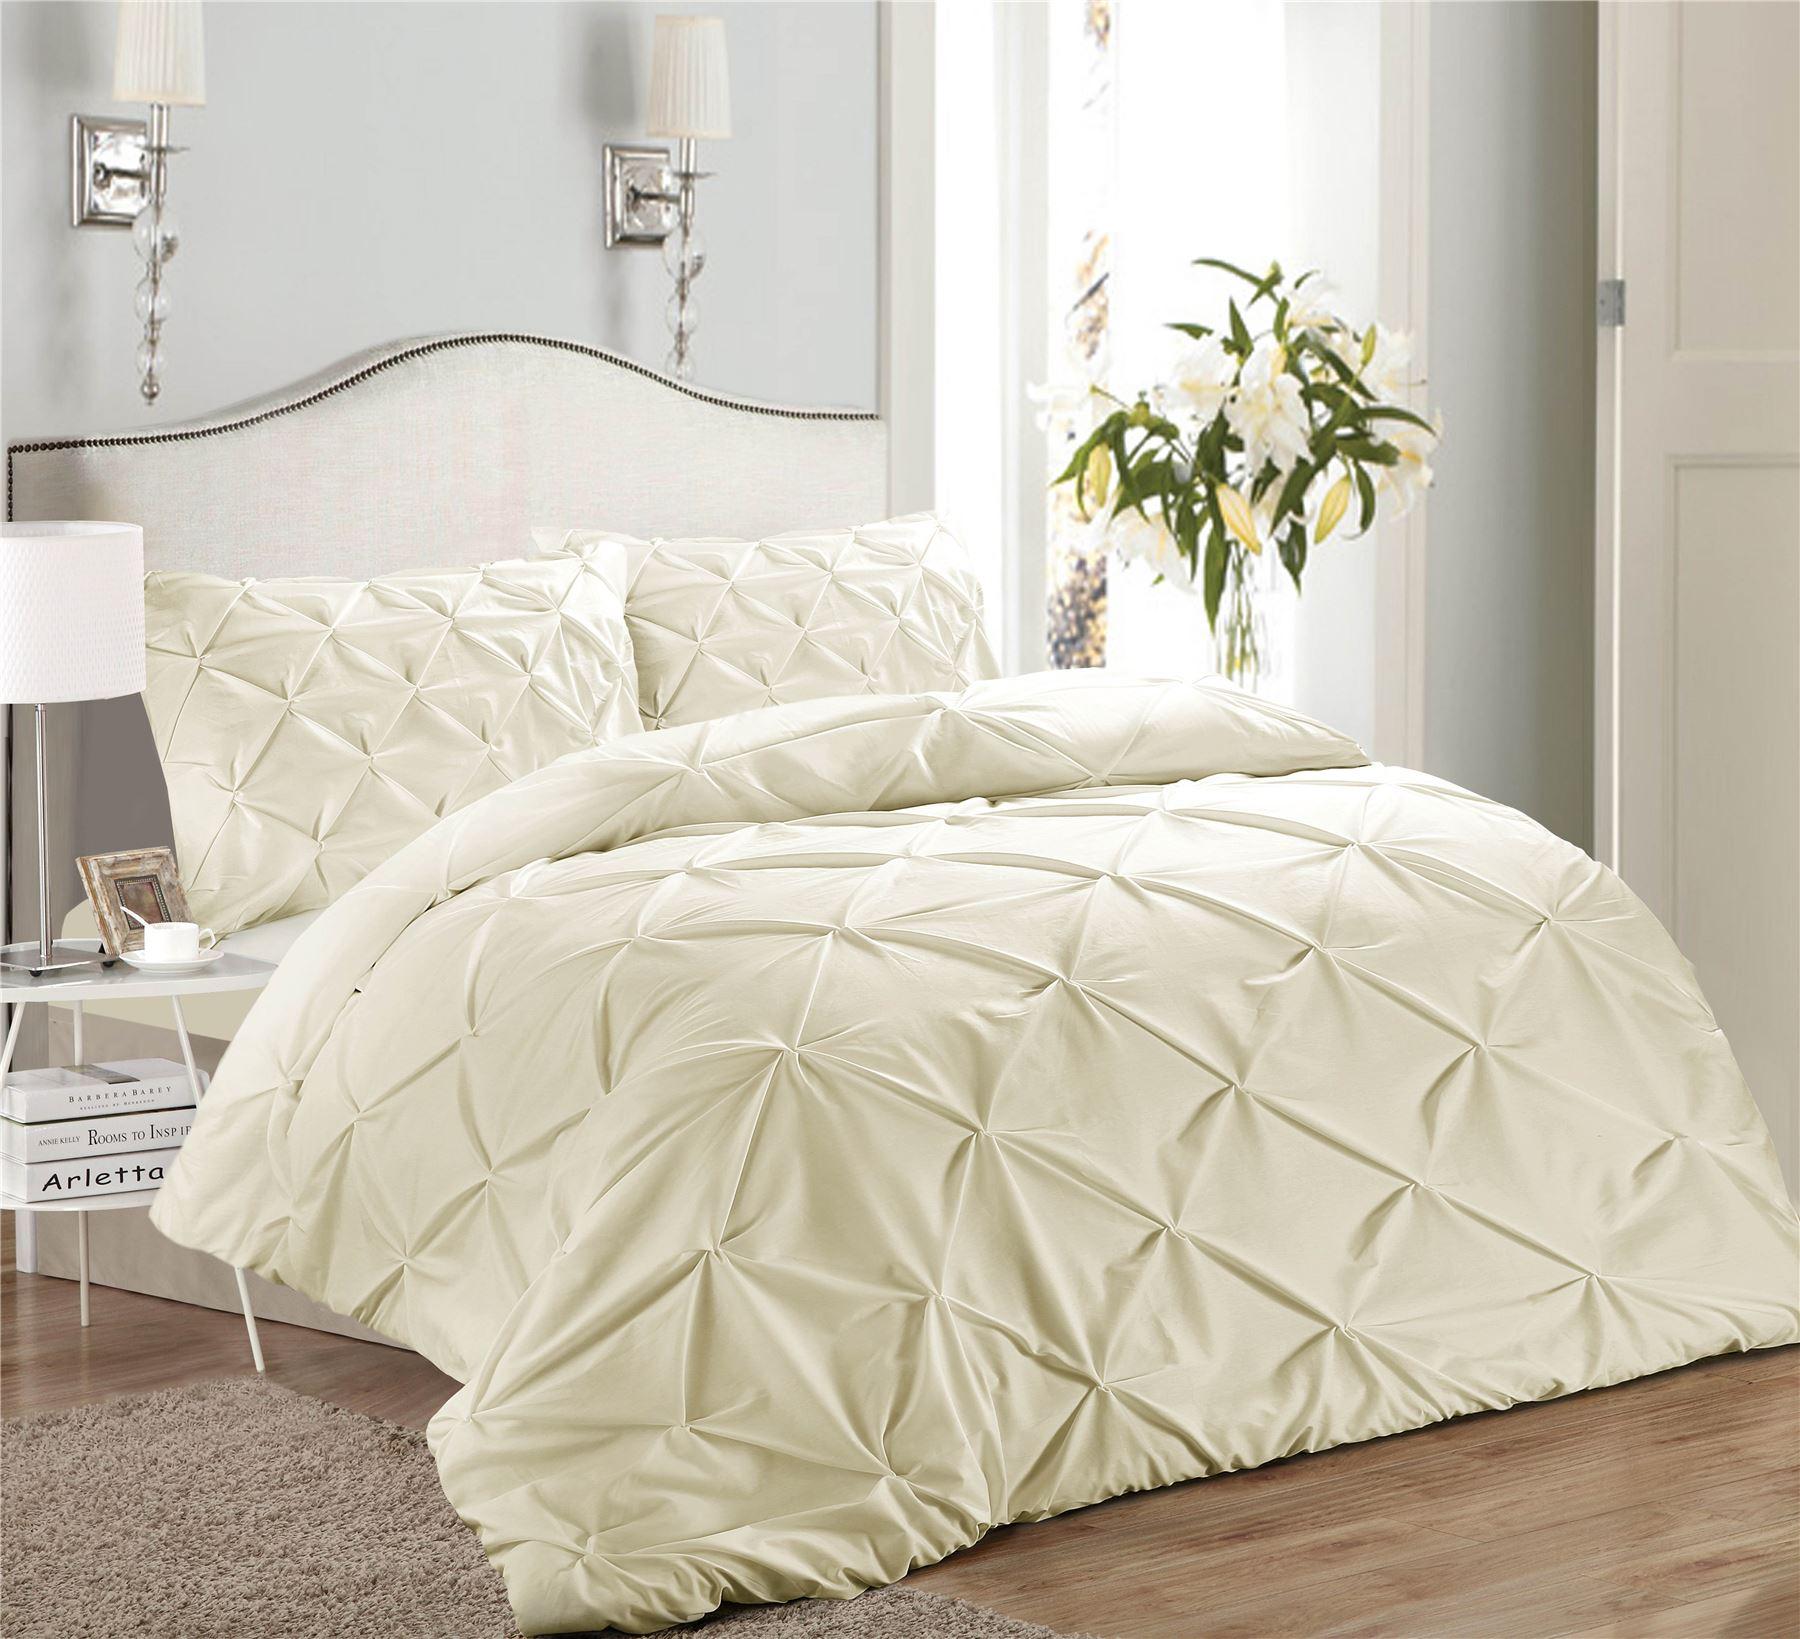 Luxury-Pure-100-Cotton-200-Thread-Pinch-Pleat-Pintuck-Puckering-Duvet-Cover-Set thumbnail 10